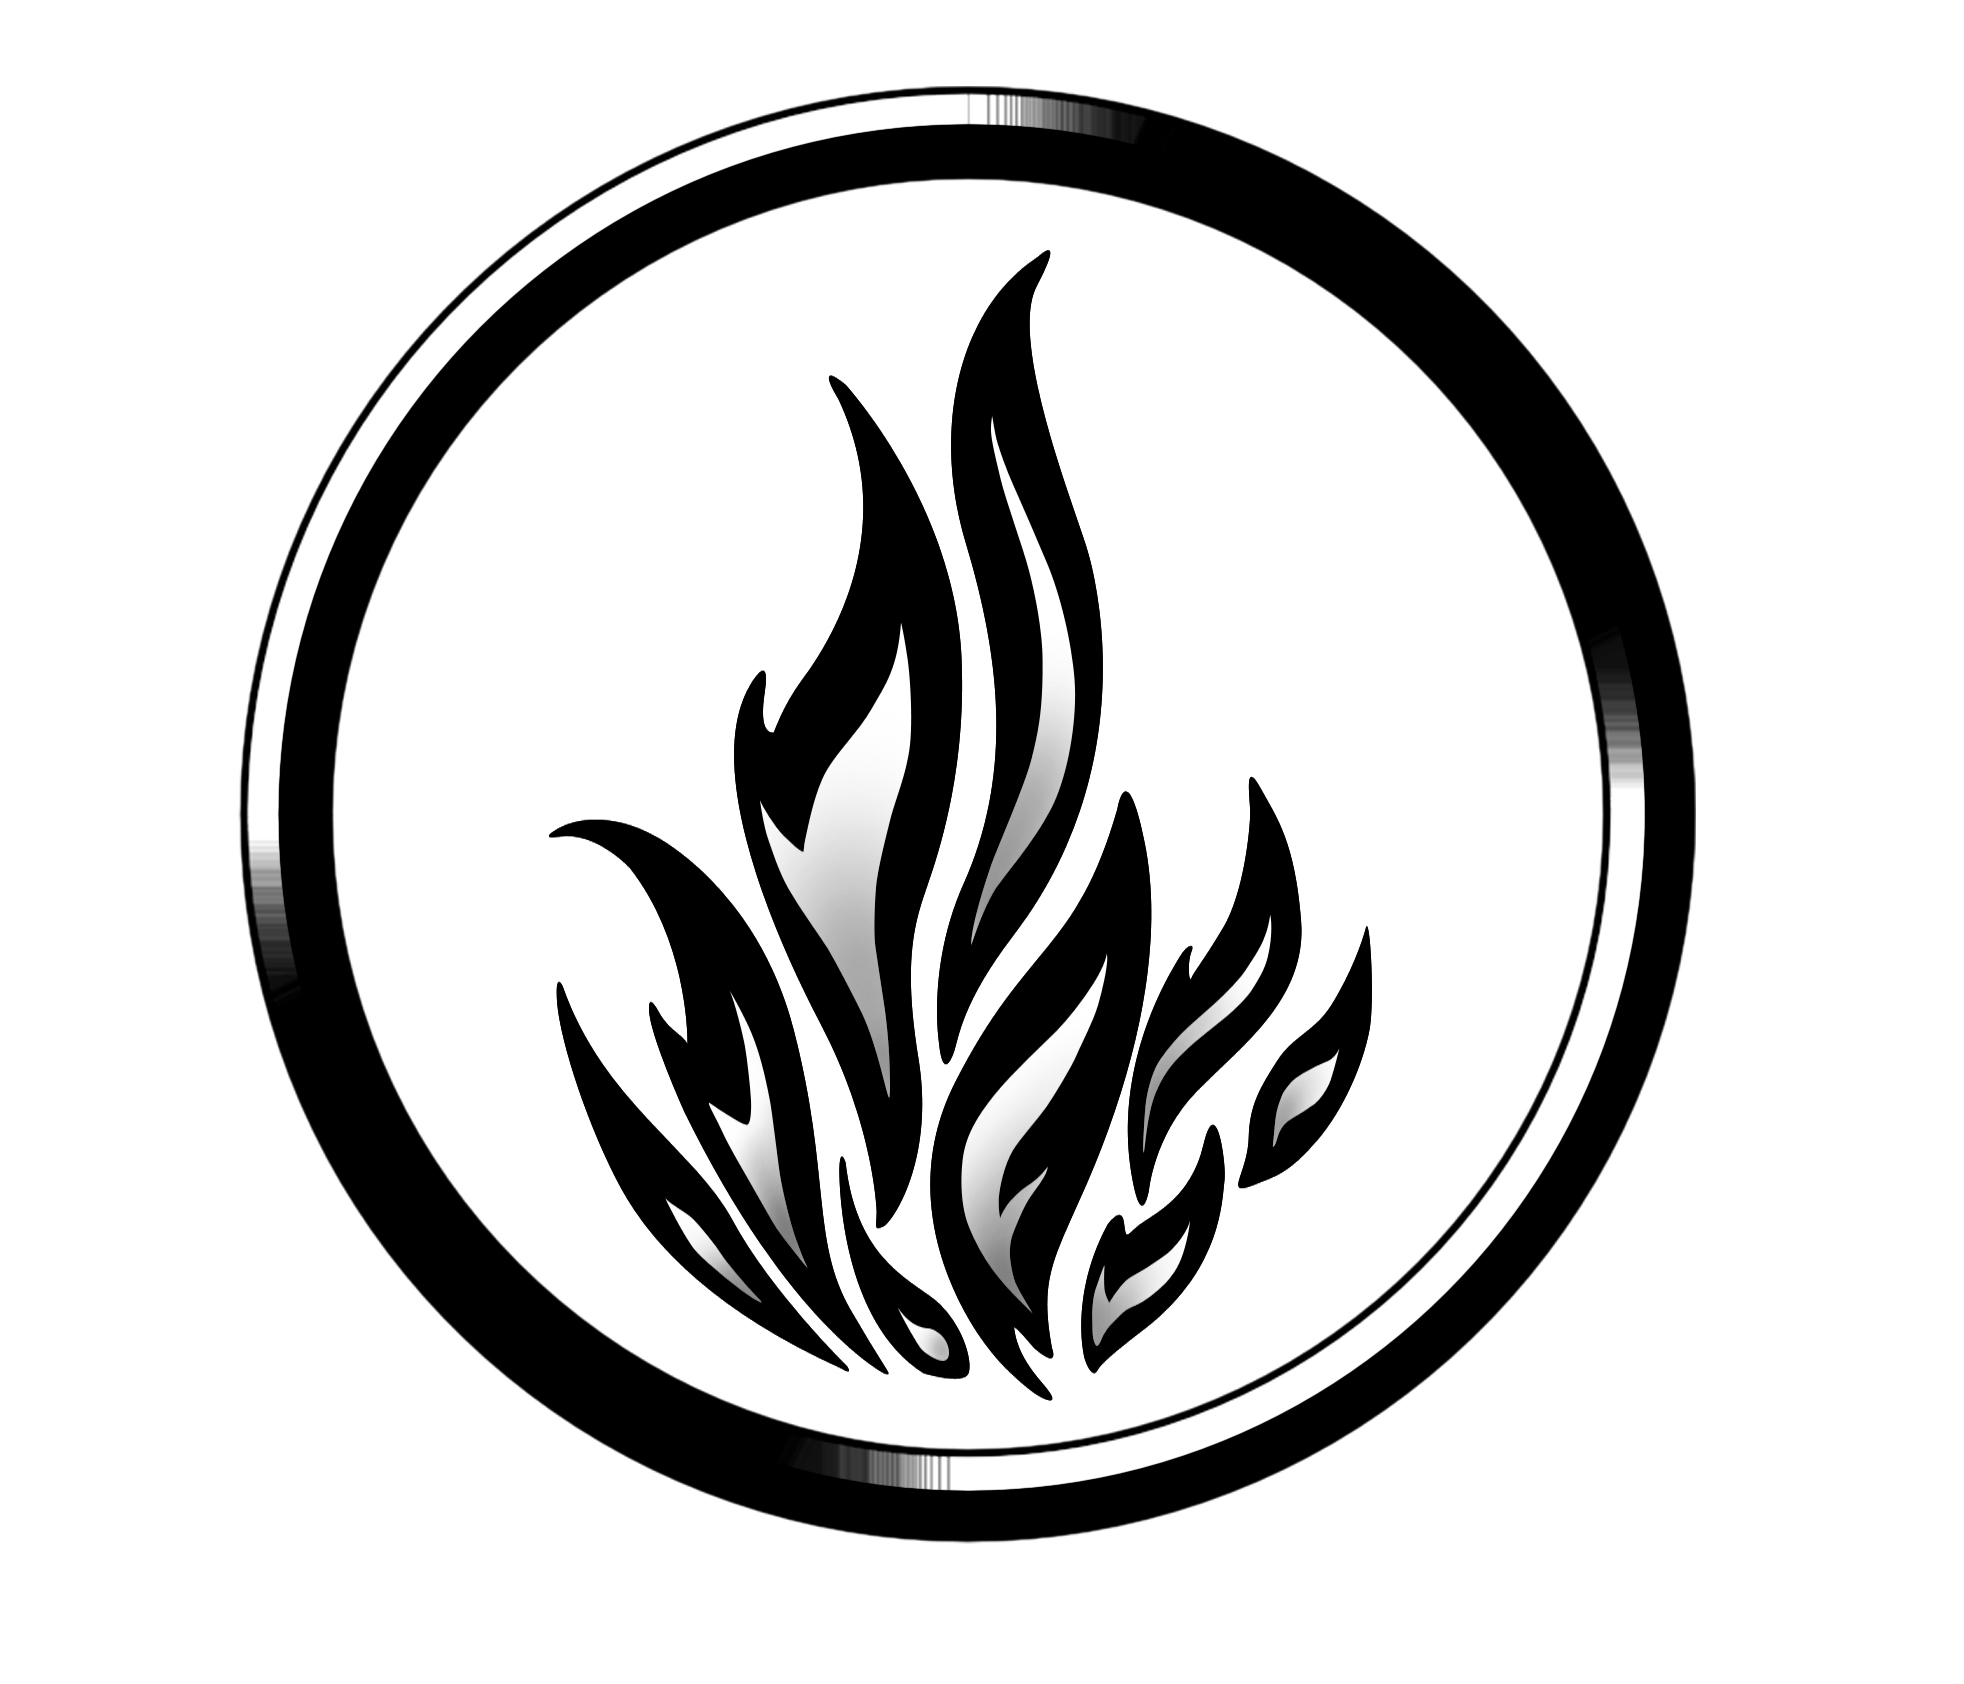 divergent factions symbols black and white wwwimgkid